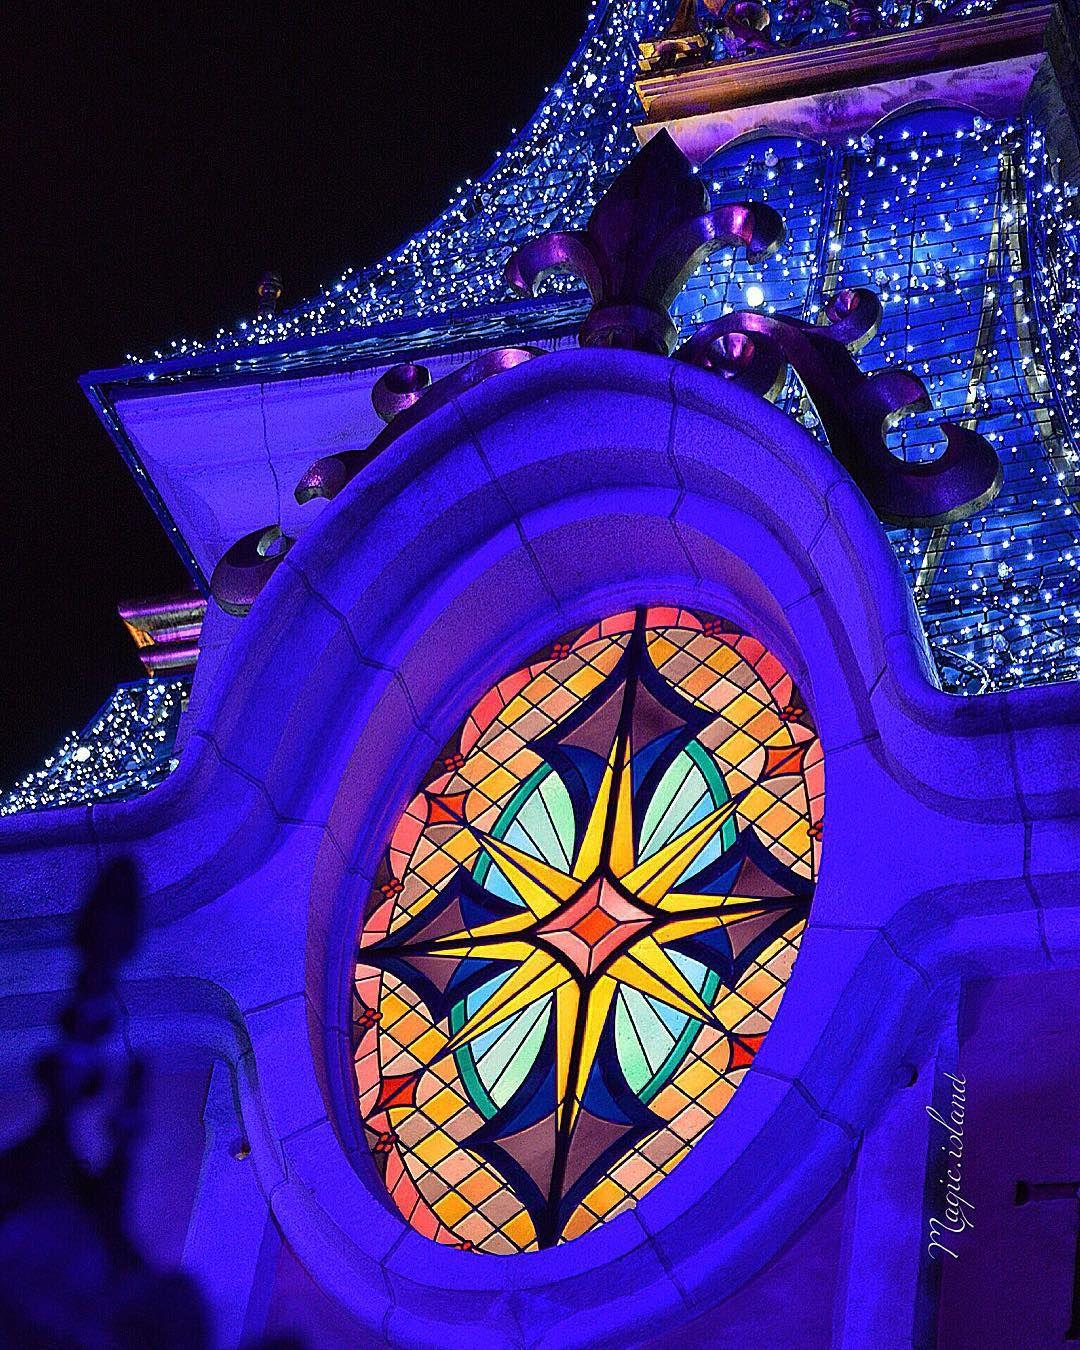 """✨ #castle #christmas #night #disney #disneyland #disneylandparis #disneyworld #waltdisneyworld #magic #magickingdom #details"""